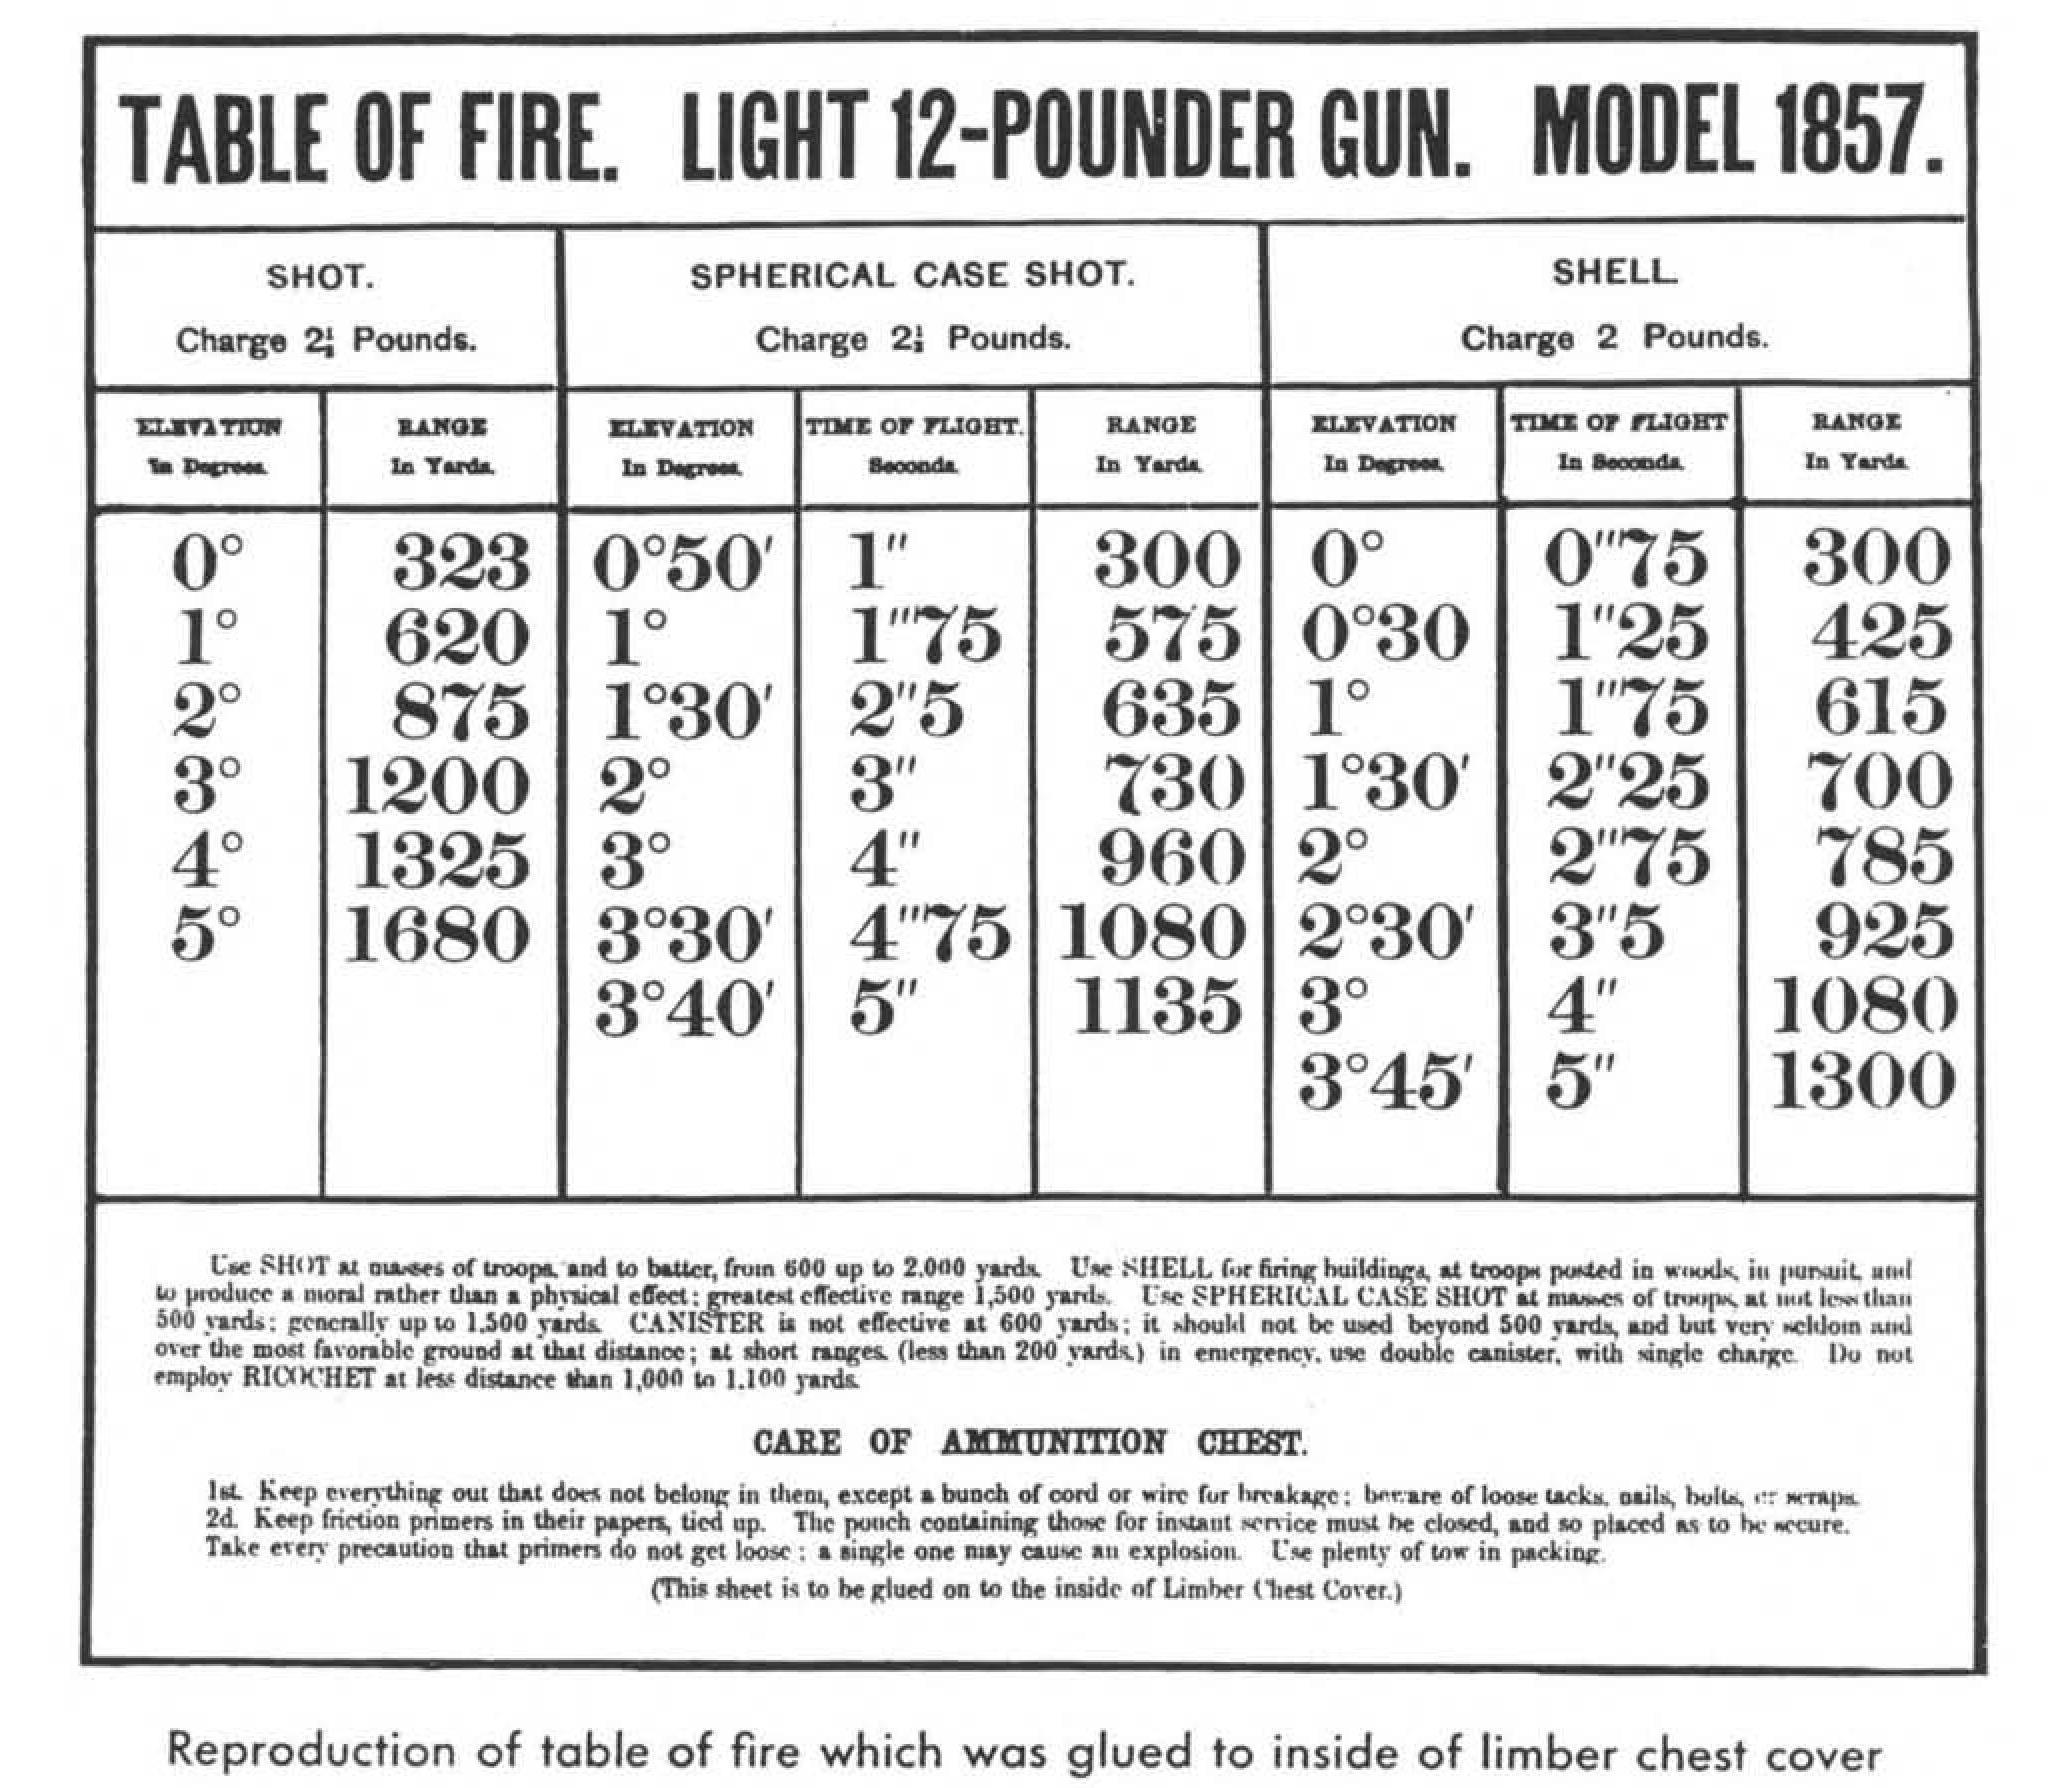 File:AMERICAN CIVIL WAR ARTILLERY PROJECTILES 05.jpg - Wikimedia Commons